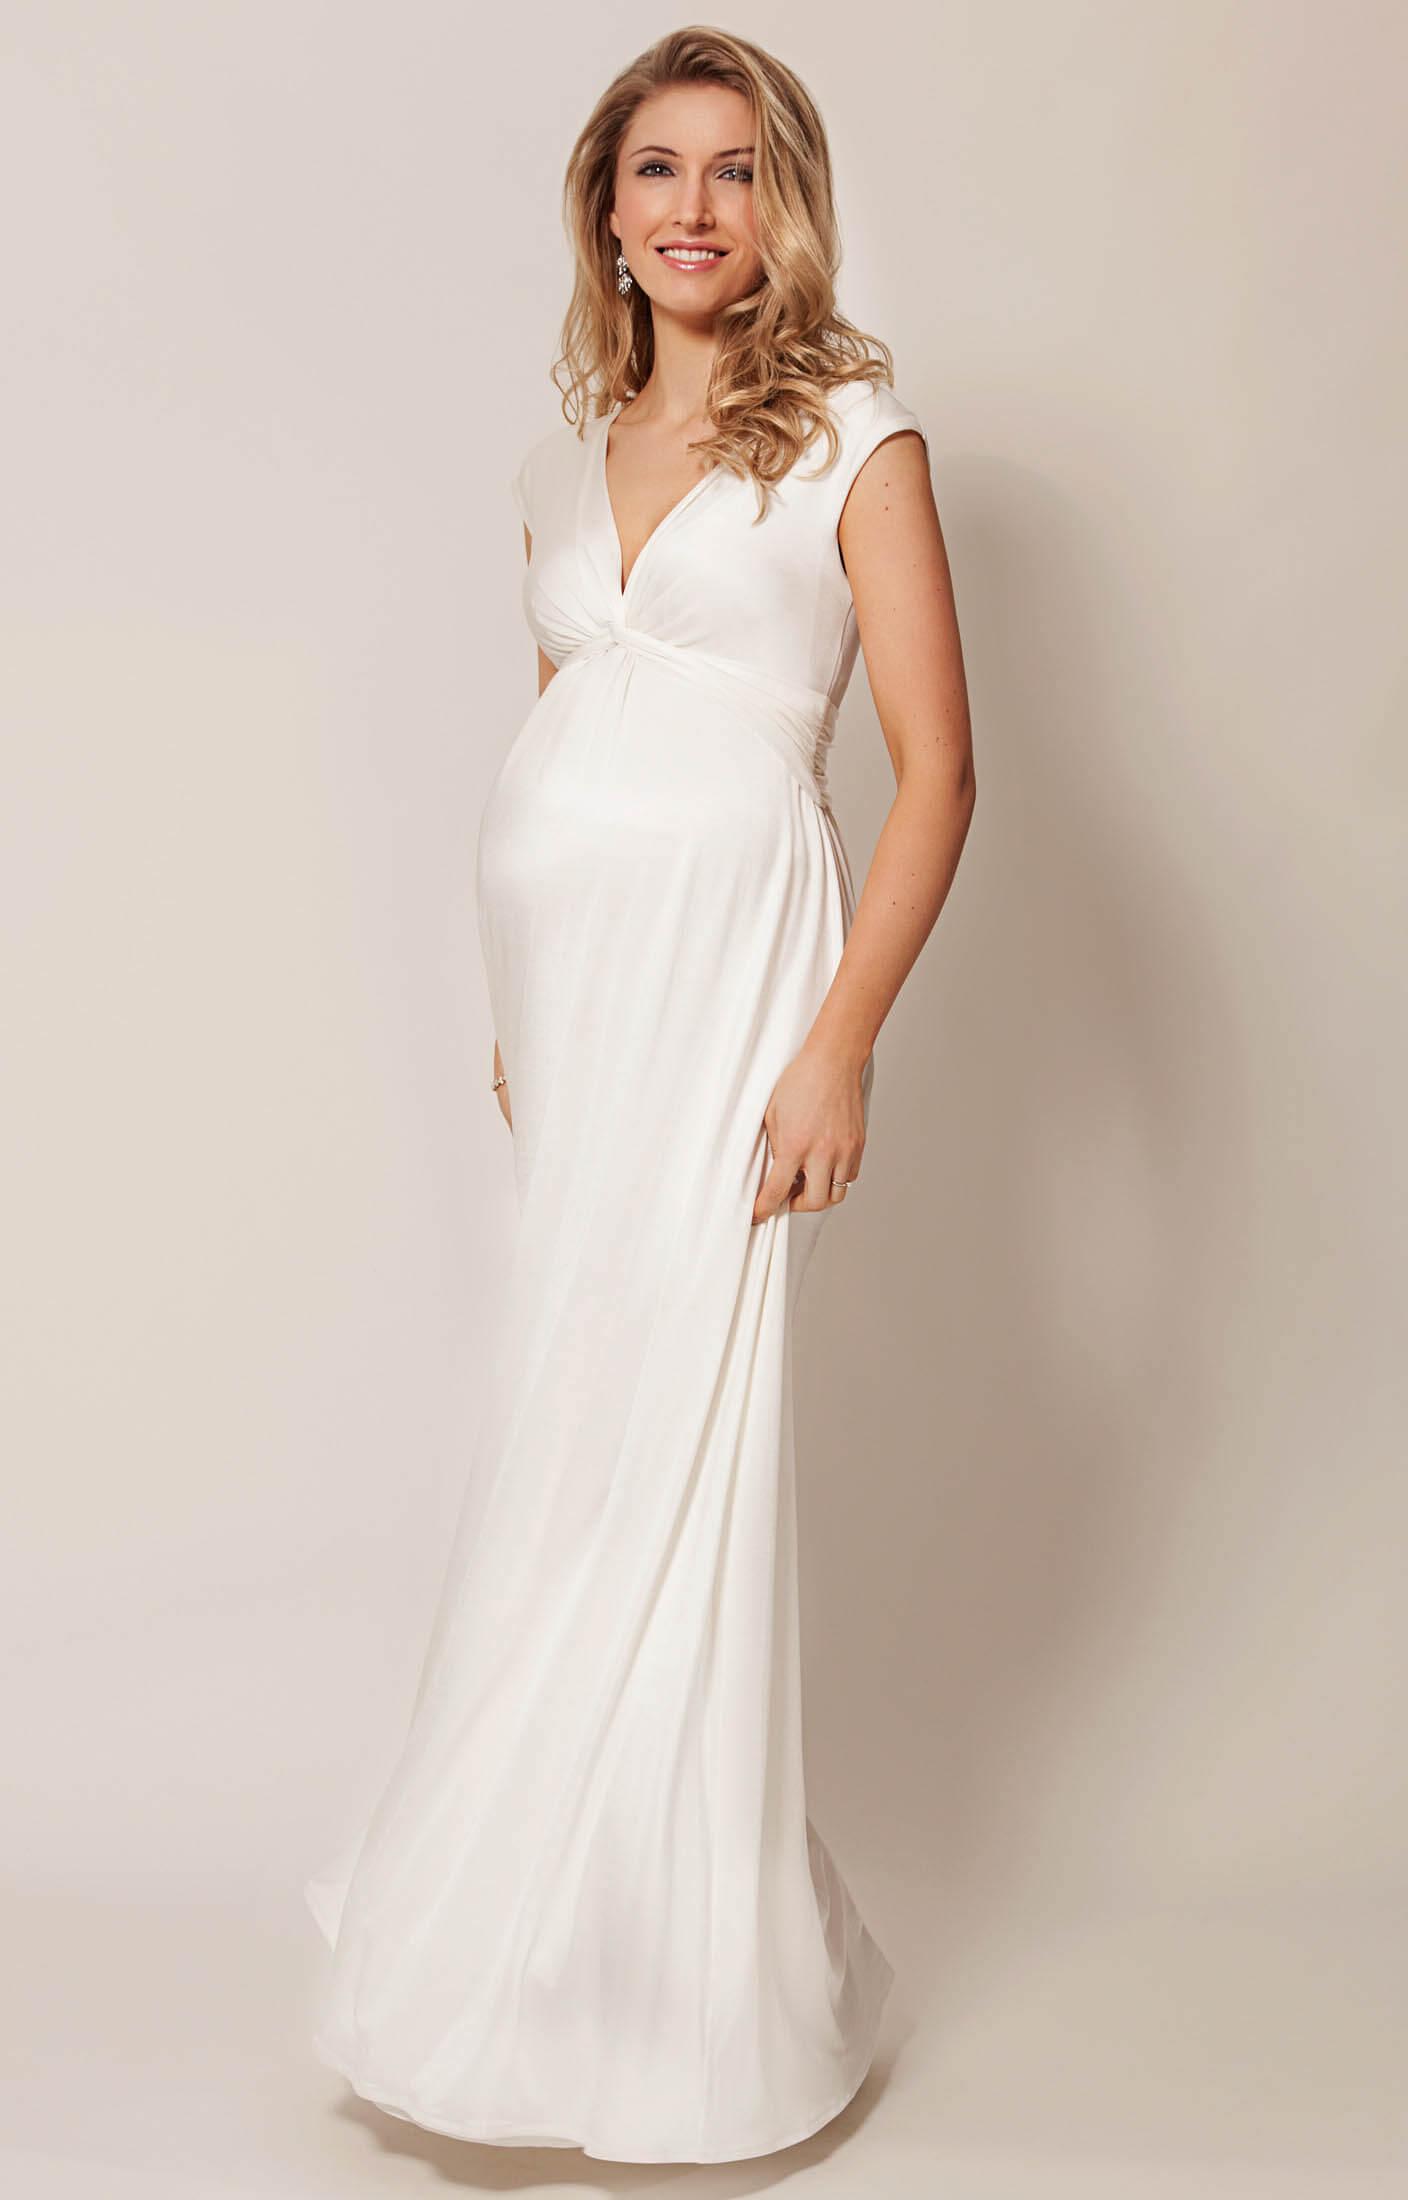 Clara Maternity Wedding Gown Long Ivory  Maternity